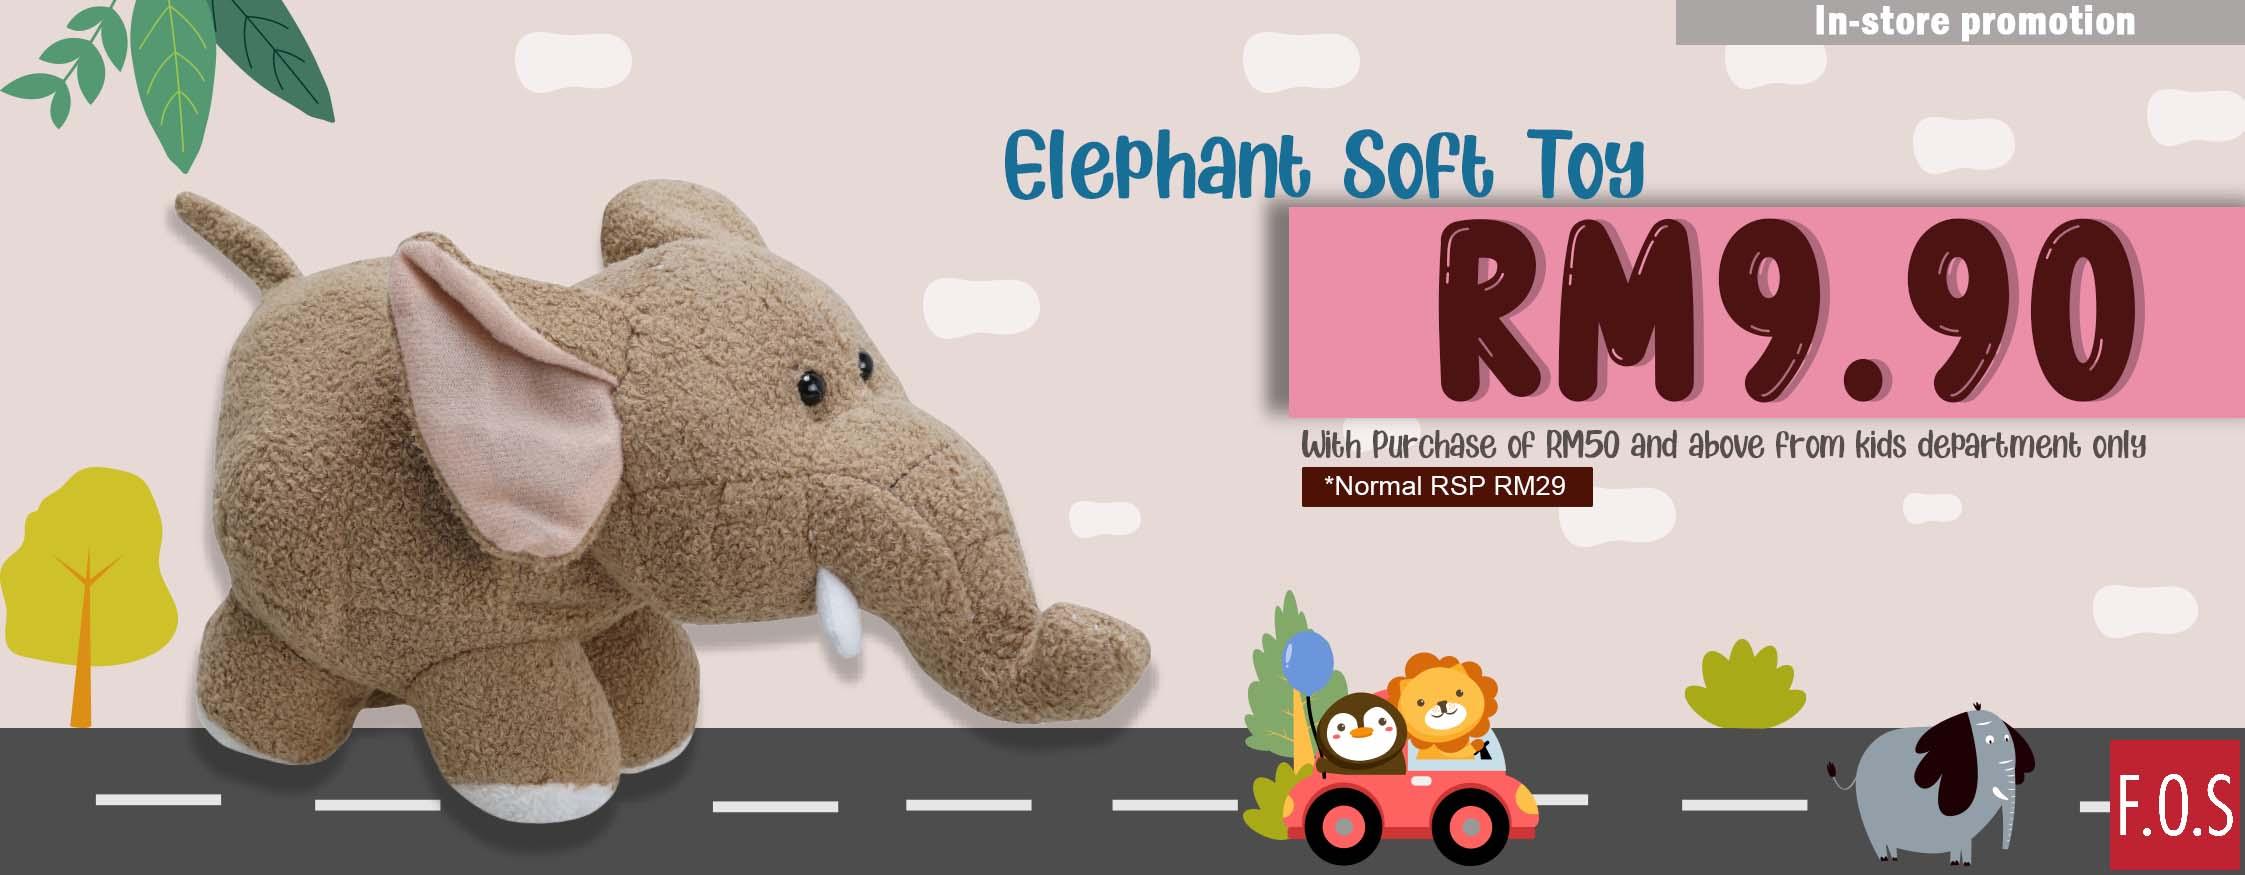 TOYS ELEPHANT banner